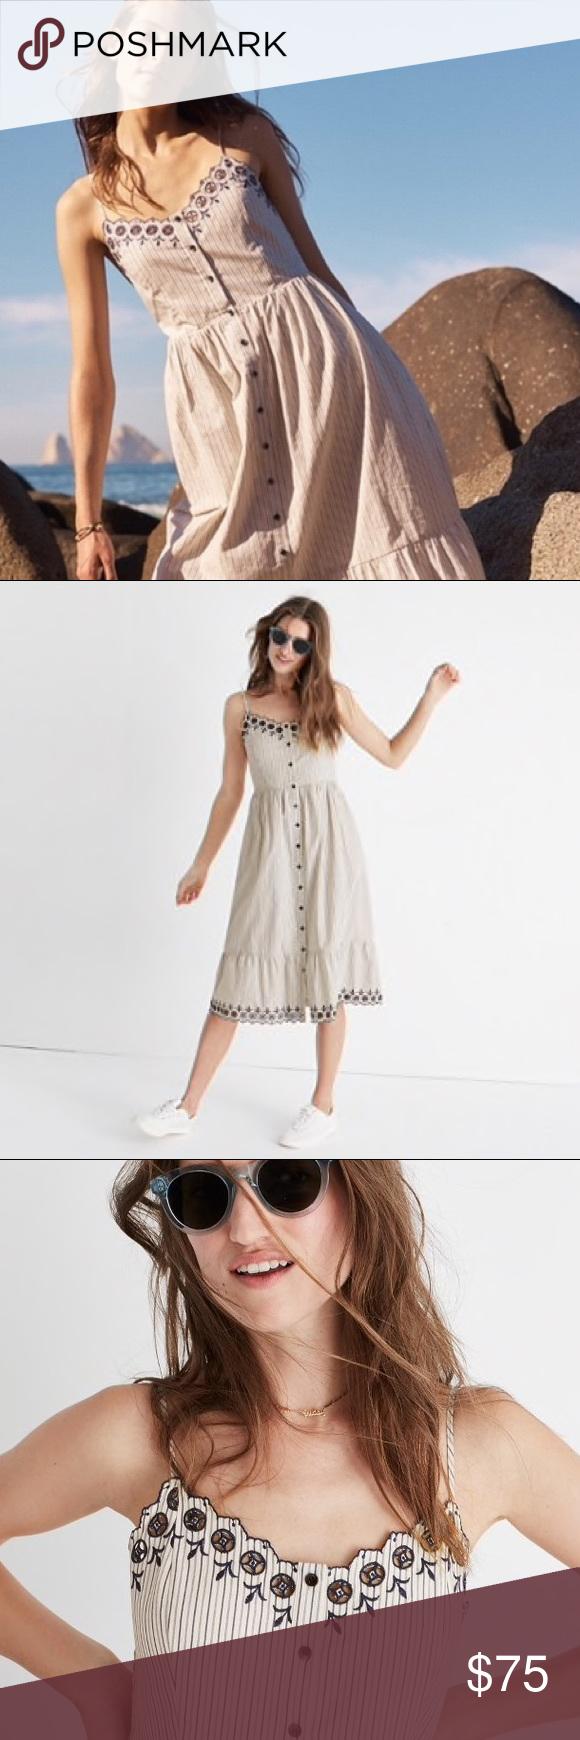 Madewell Embroidered Jardin Midi Dress Fashion Embroidered Midi Dress Madewell Dresses [ 1740 x 580 Pixel ]